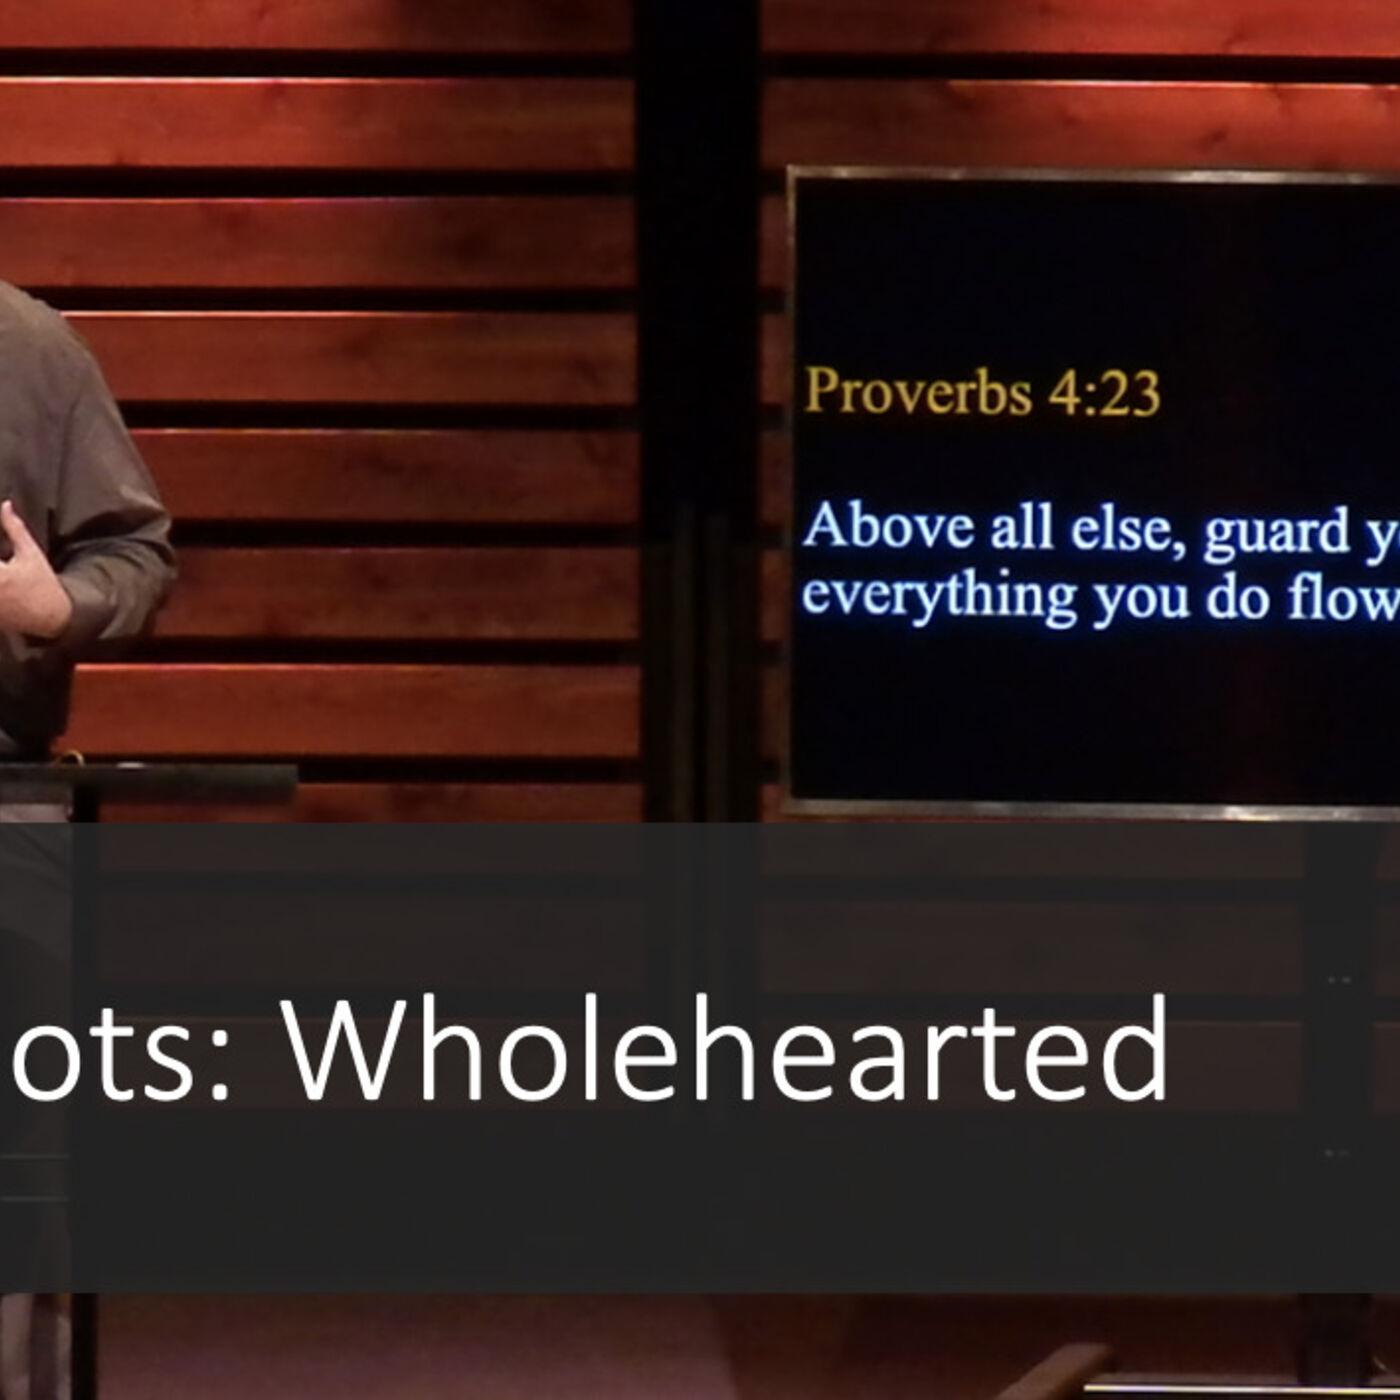 SnapShots: Wholehearted